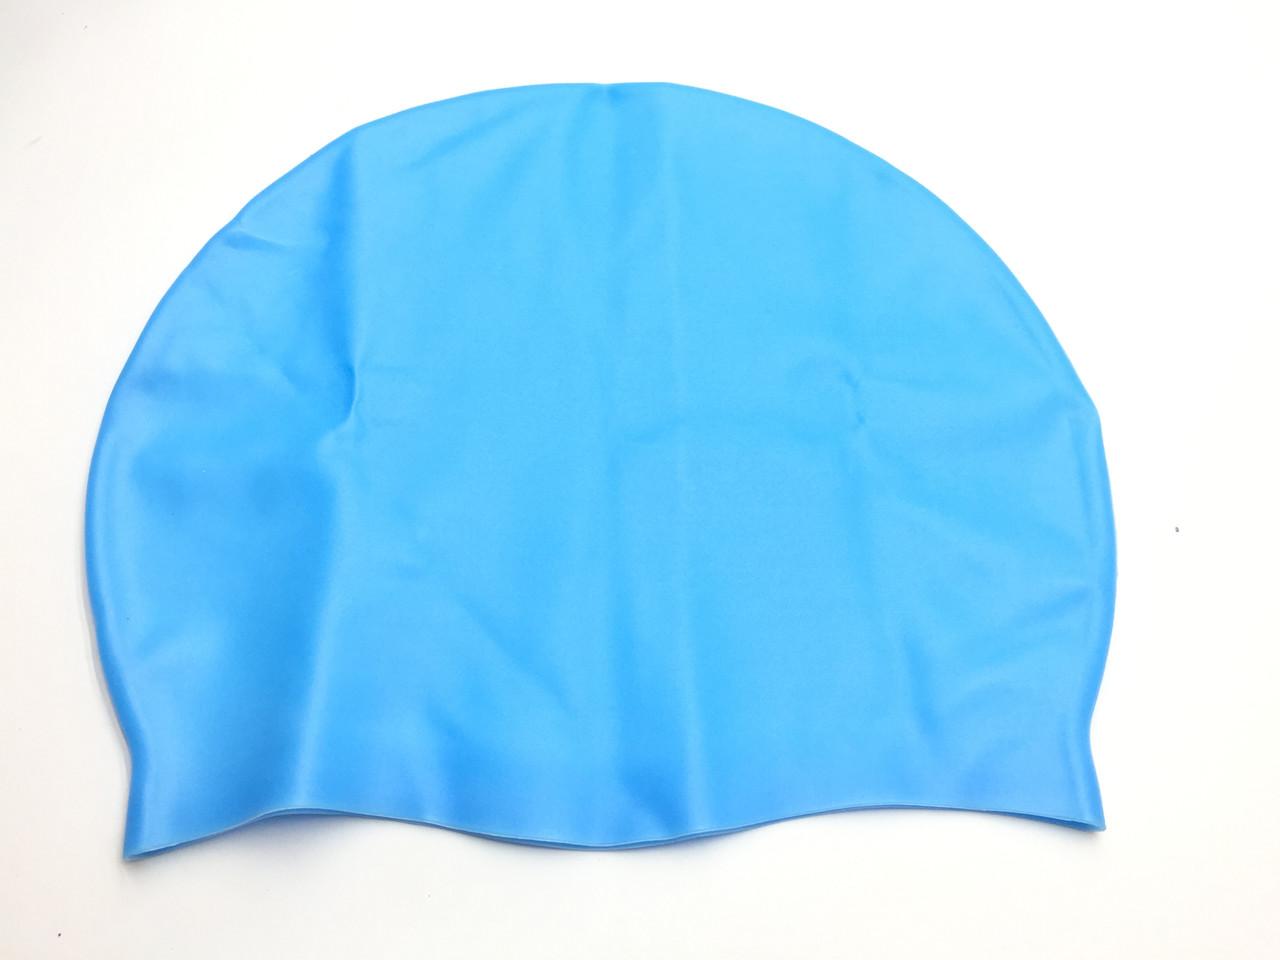 Шапочка для плавания Grilonq - 4602 (Синяя)